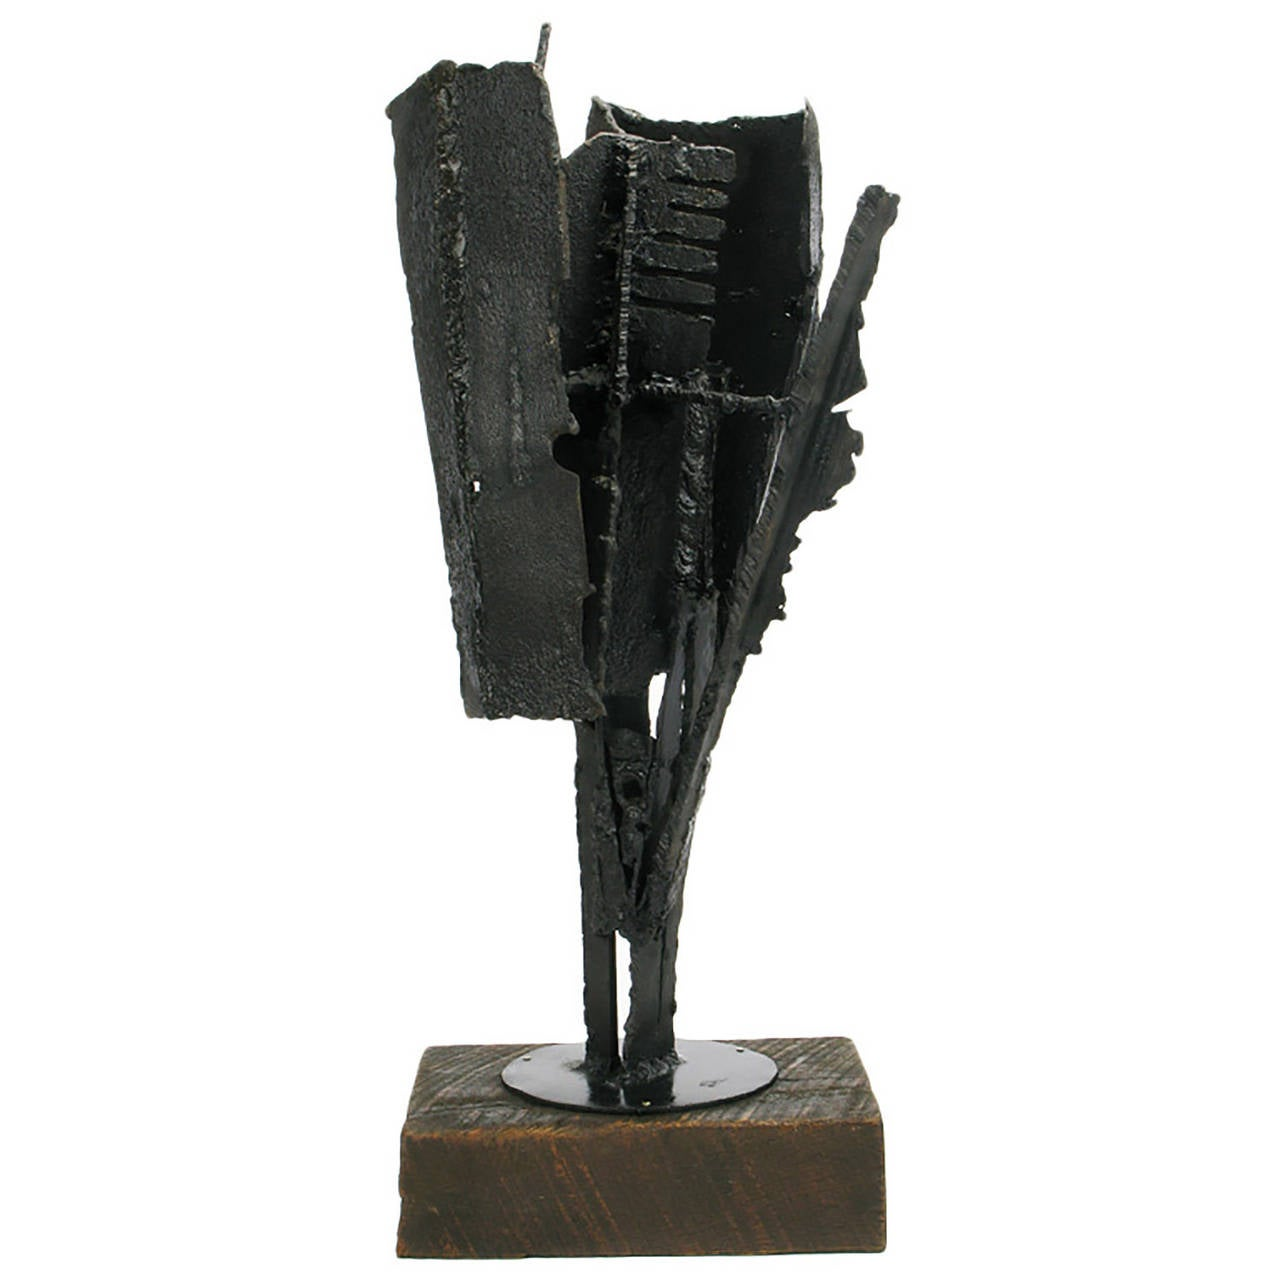 H.I. Gates Brutalist Metal Abstract Sculpture on Wood Base For Sale